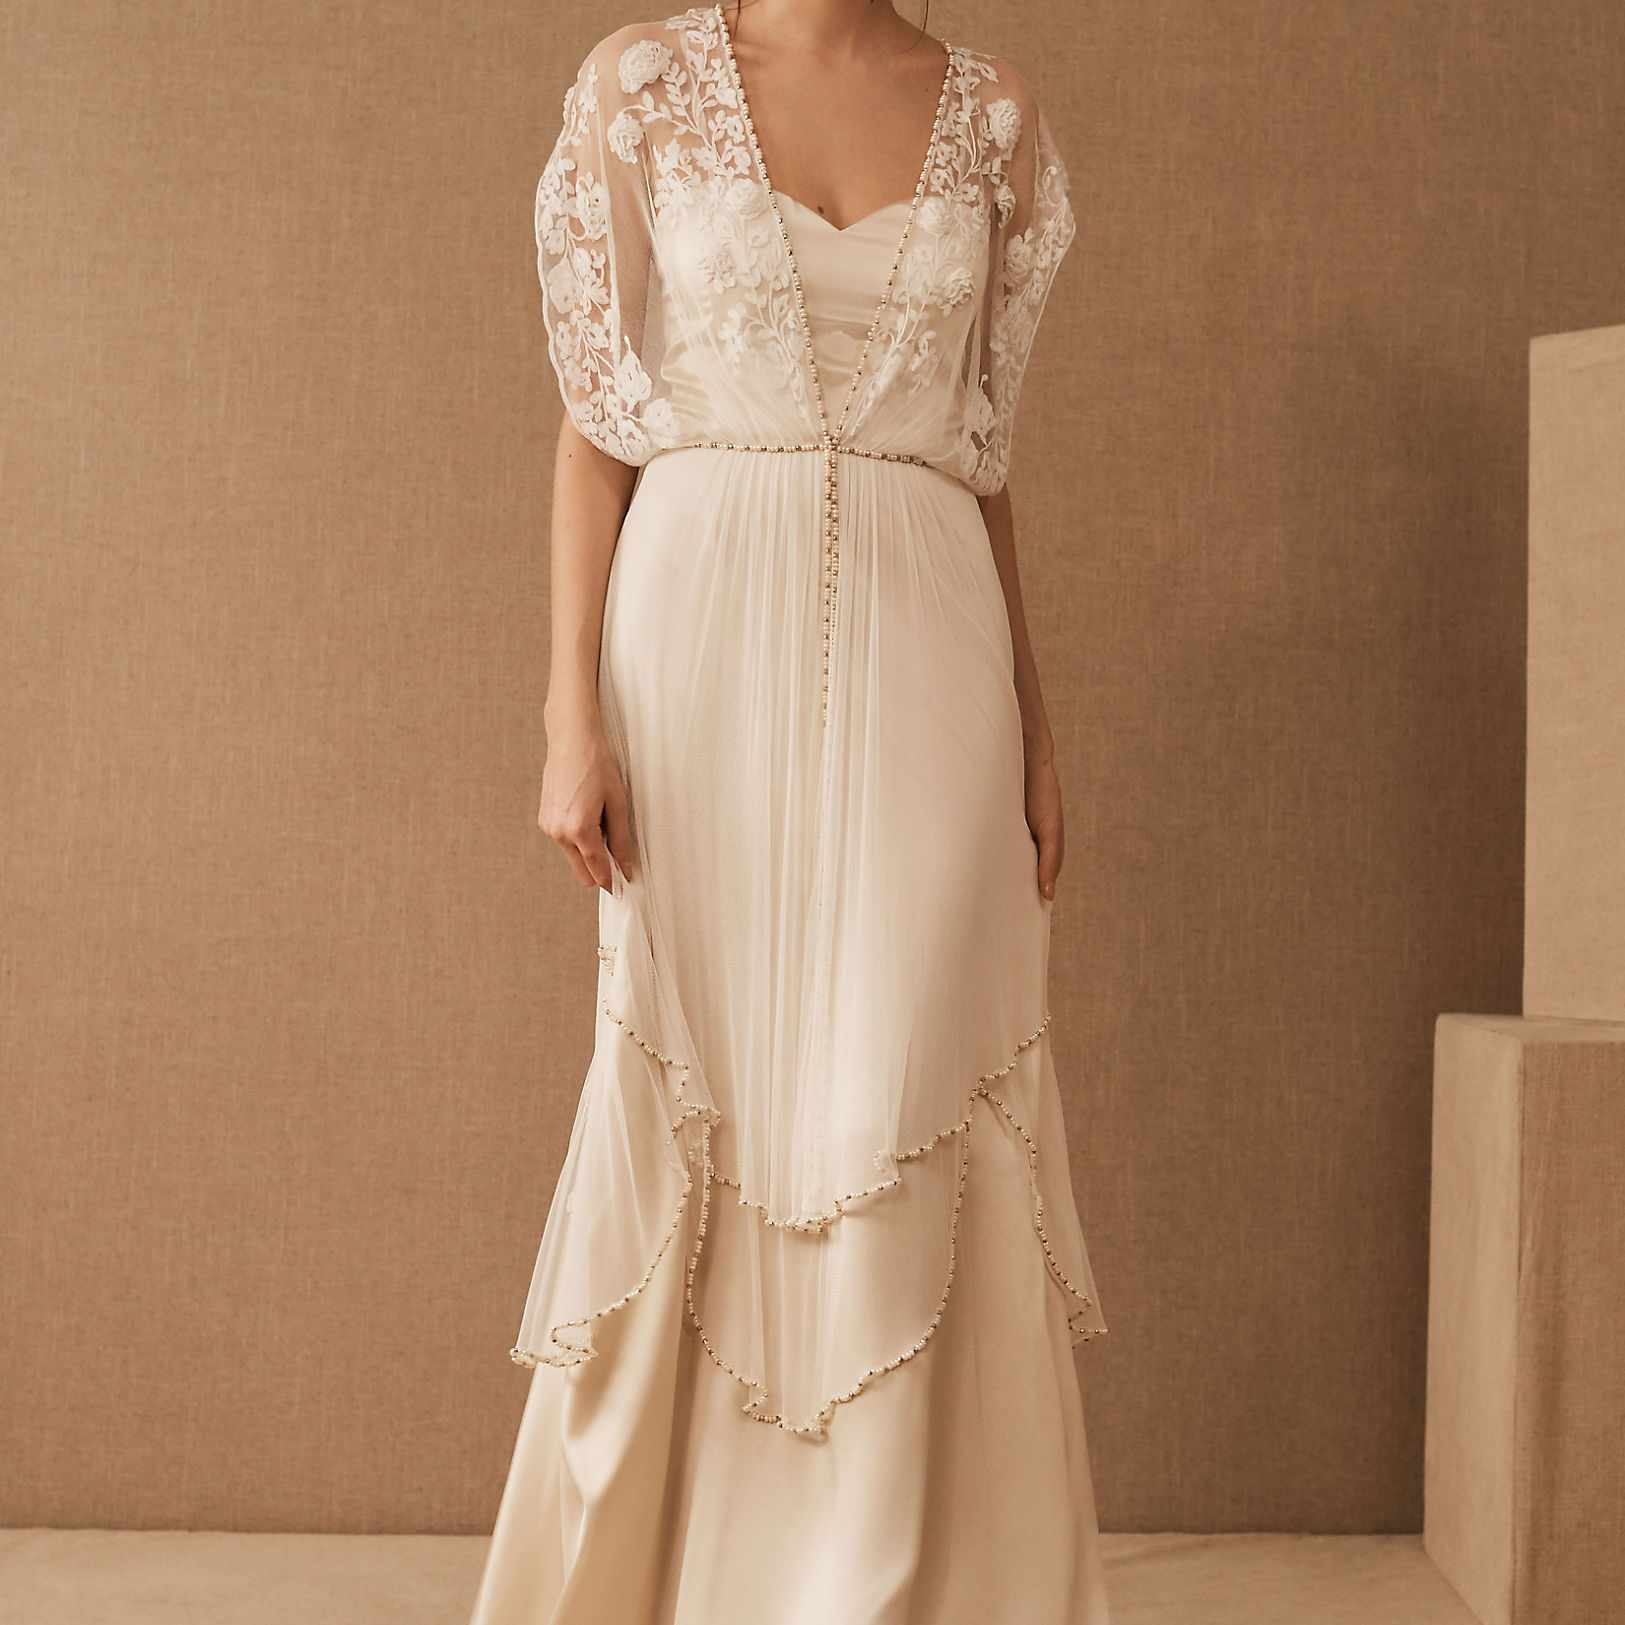 18 Best Vintage Inspired Wedding Dresses of 18